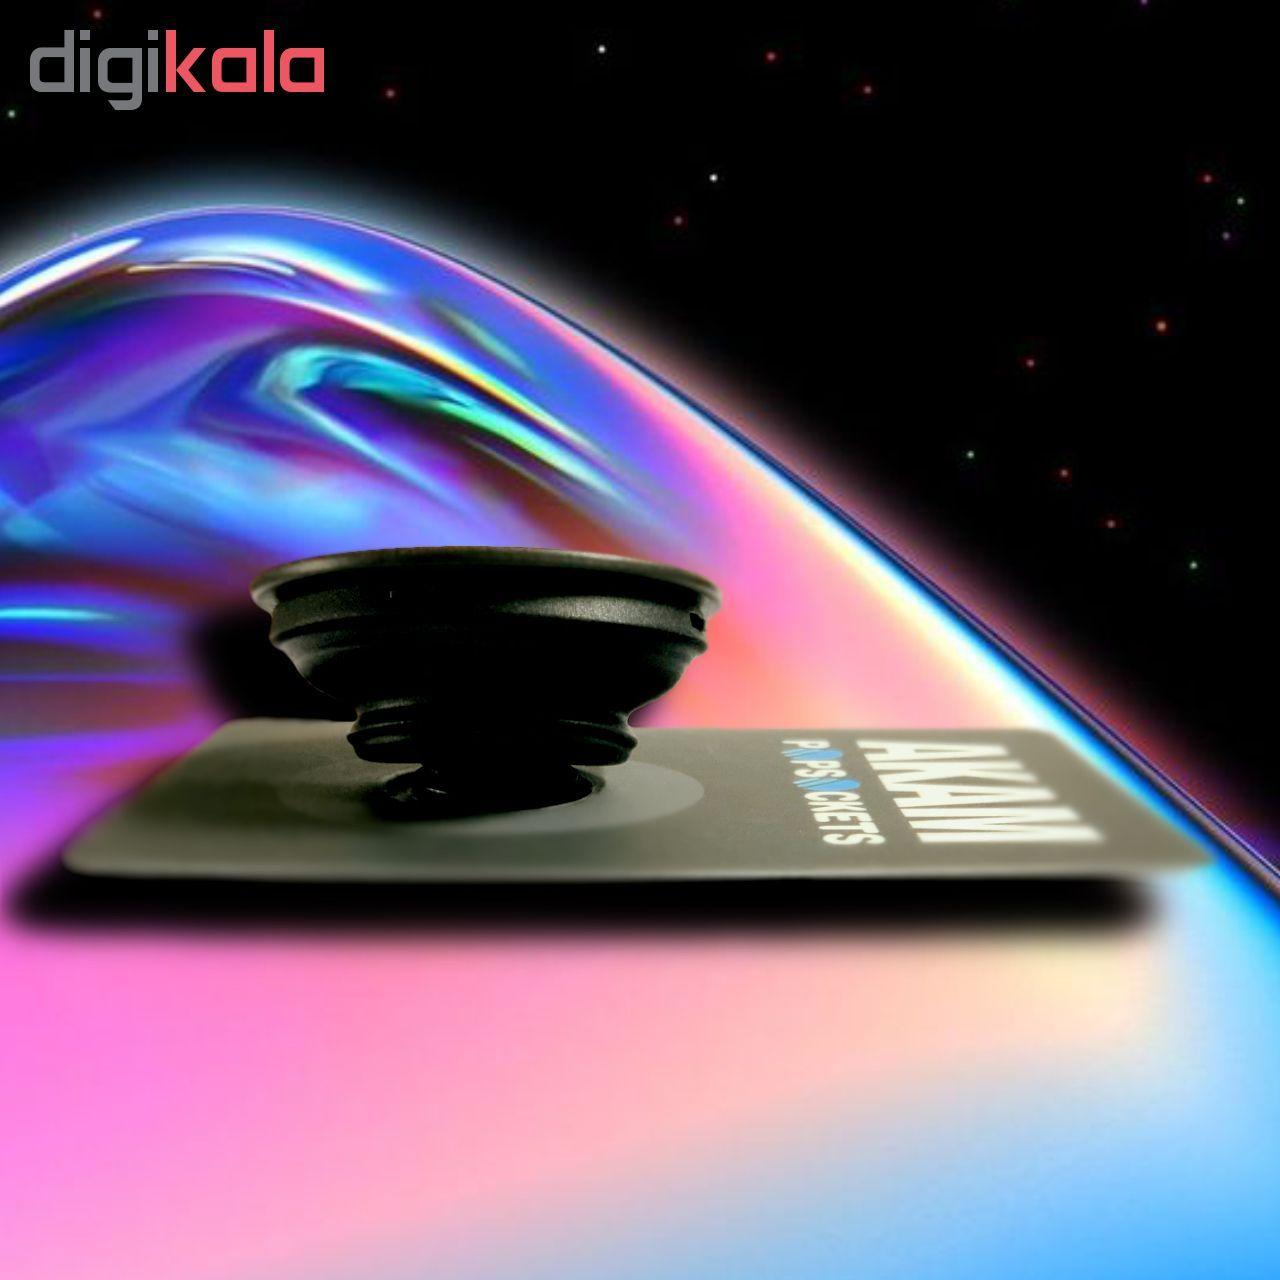 پایه نگهدارنده گوشی موبایل پاپ سوکت آکام مدل APS0286 main 1 6